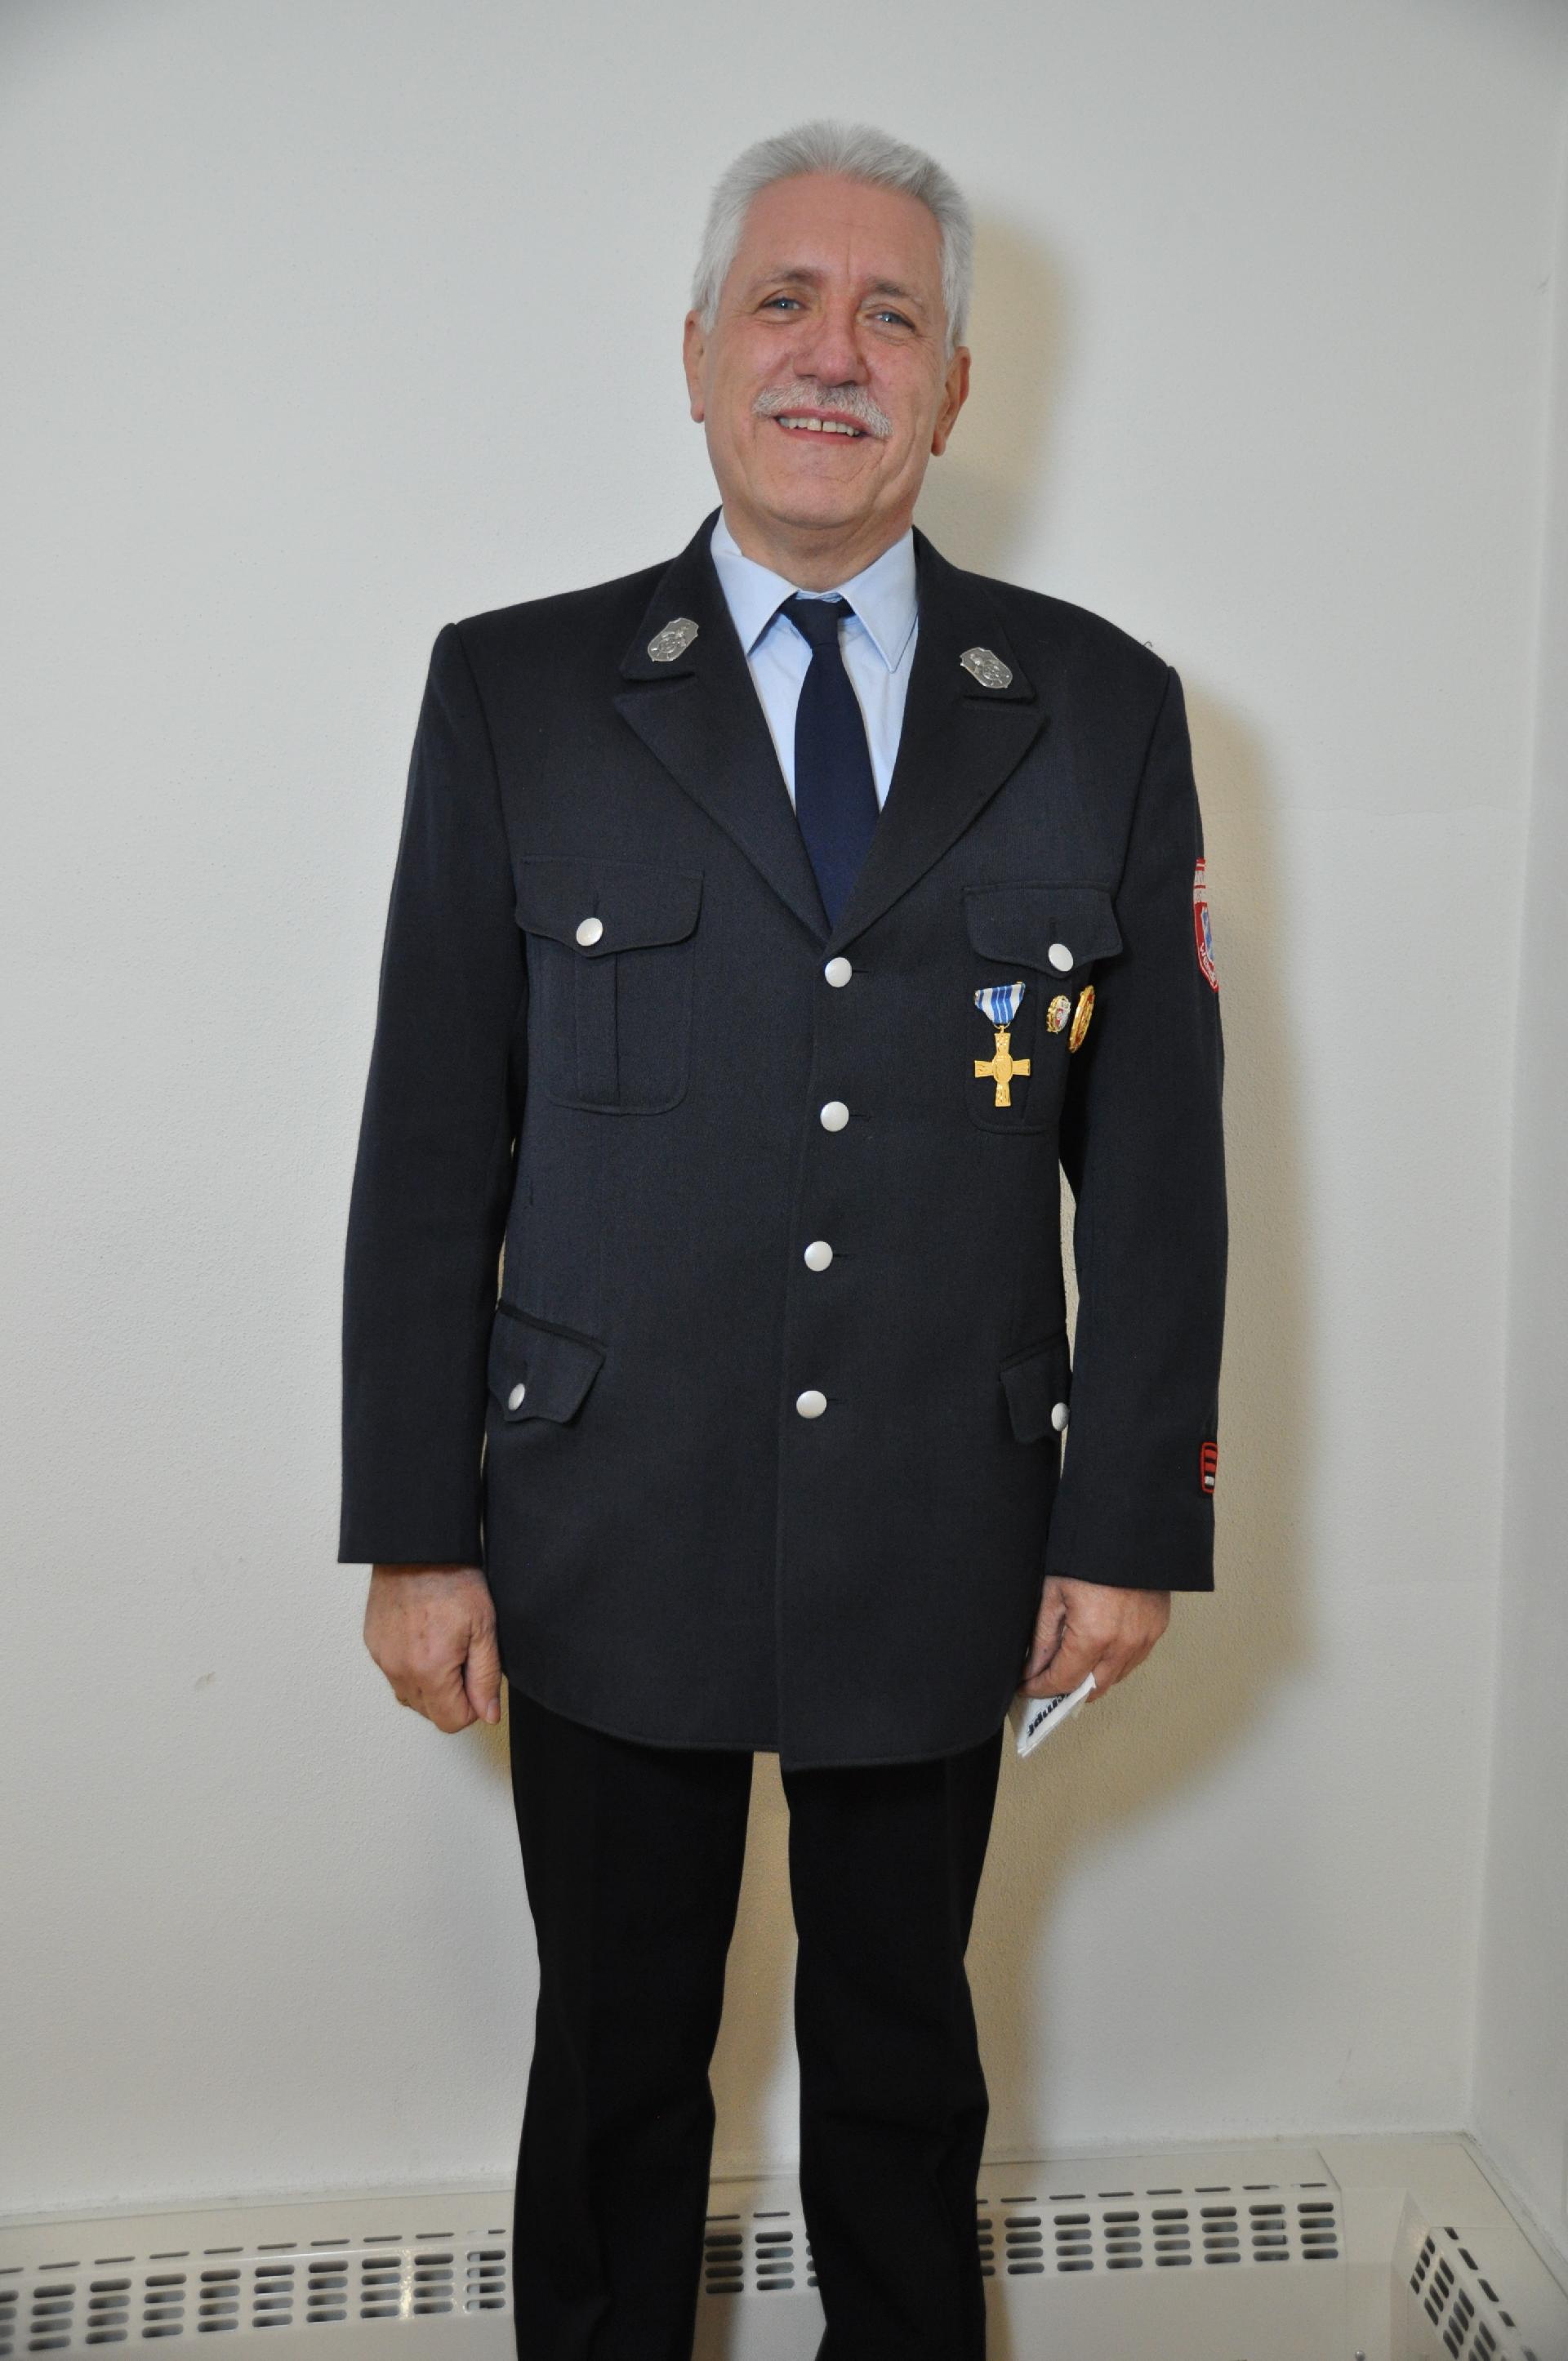 Gerald Gutsfeld